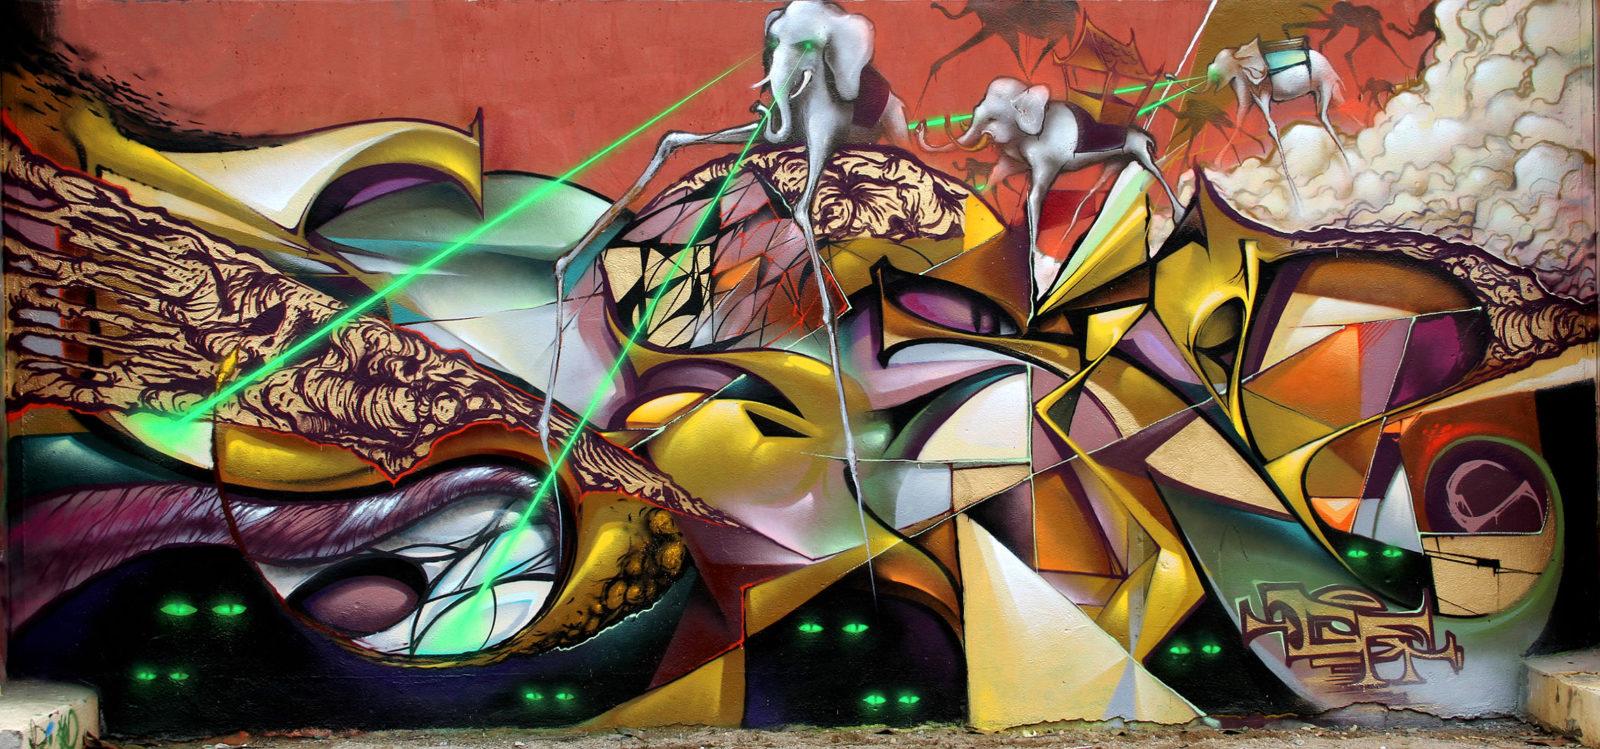 gaelricci paum sarin graffiti tatoueurs tatouage arturbain radar top5 allurbanmakers murale - Ces cinq artistes explosent les barrières entre graffiti et tatouage…